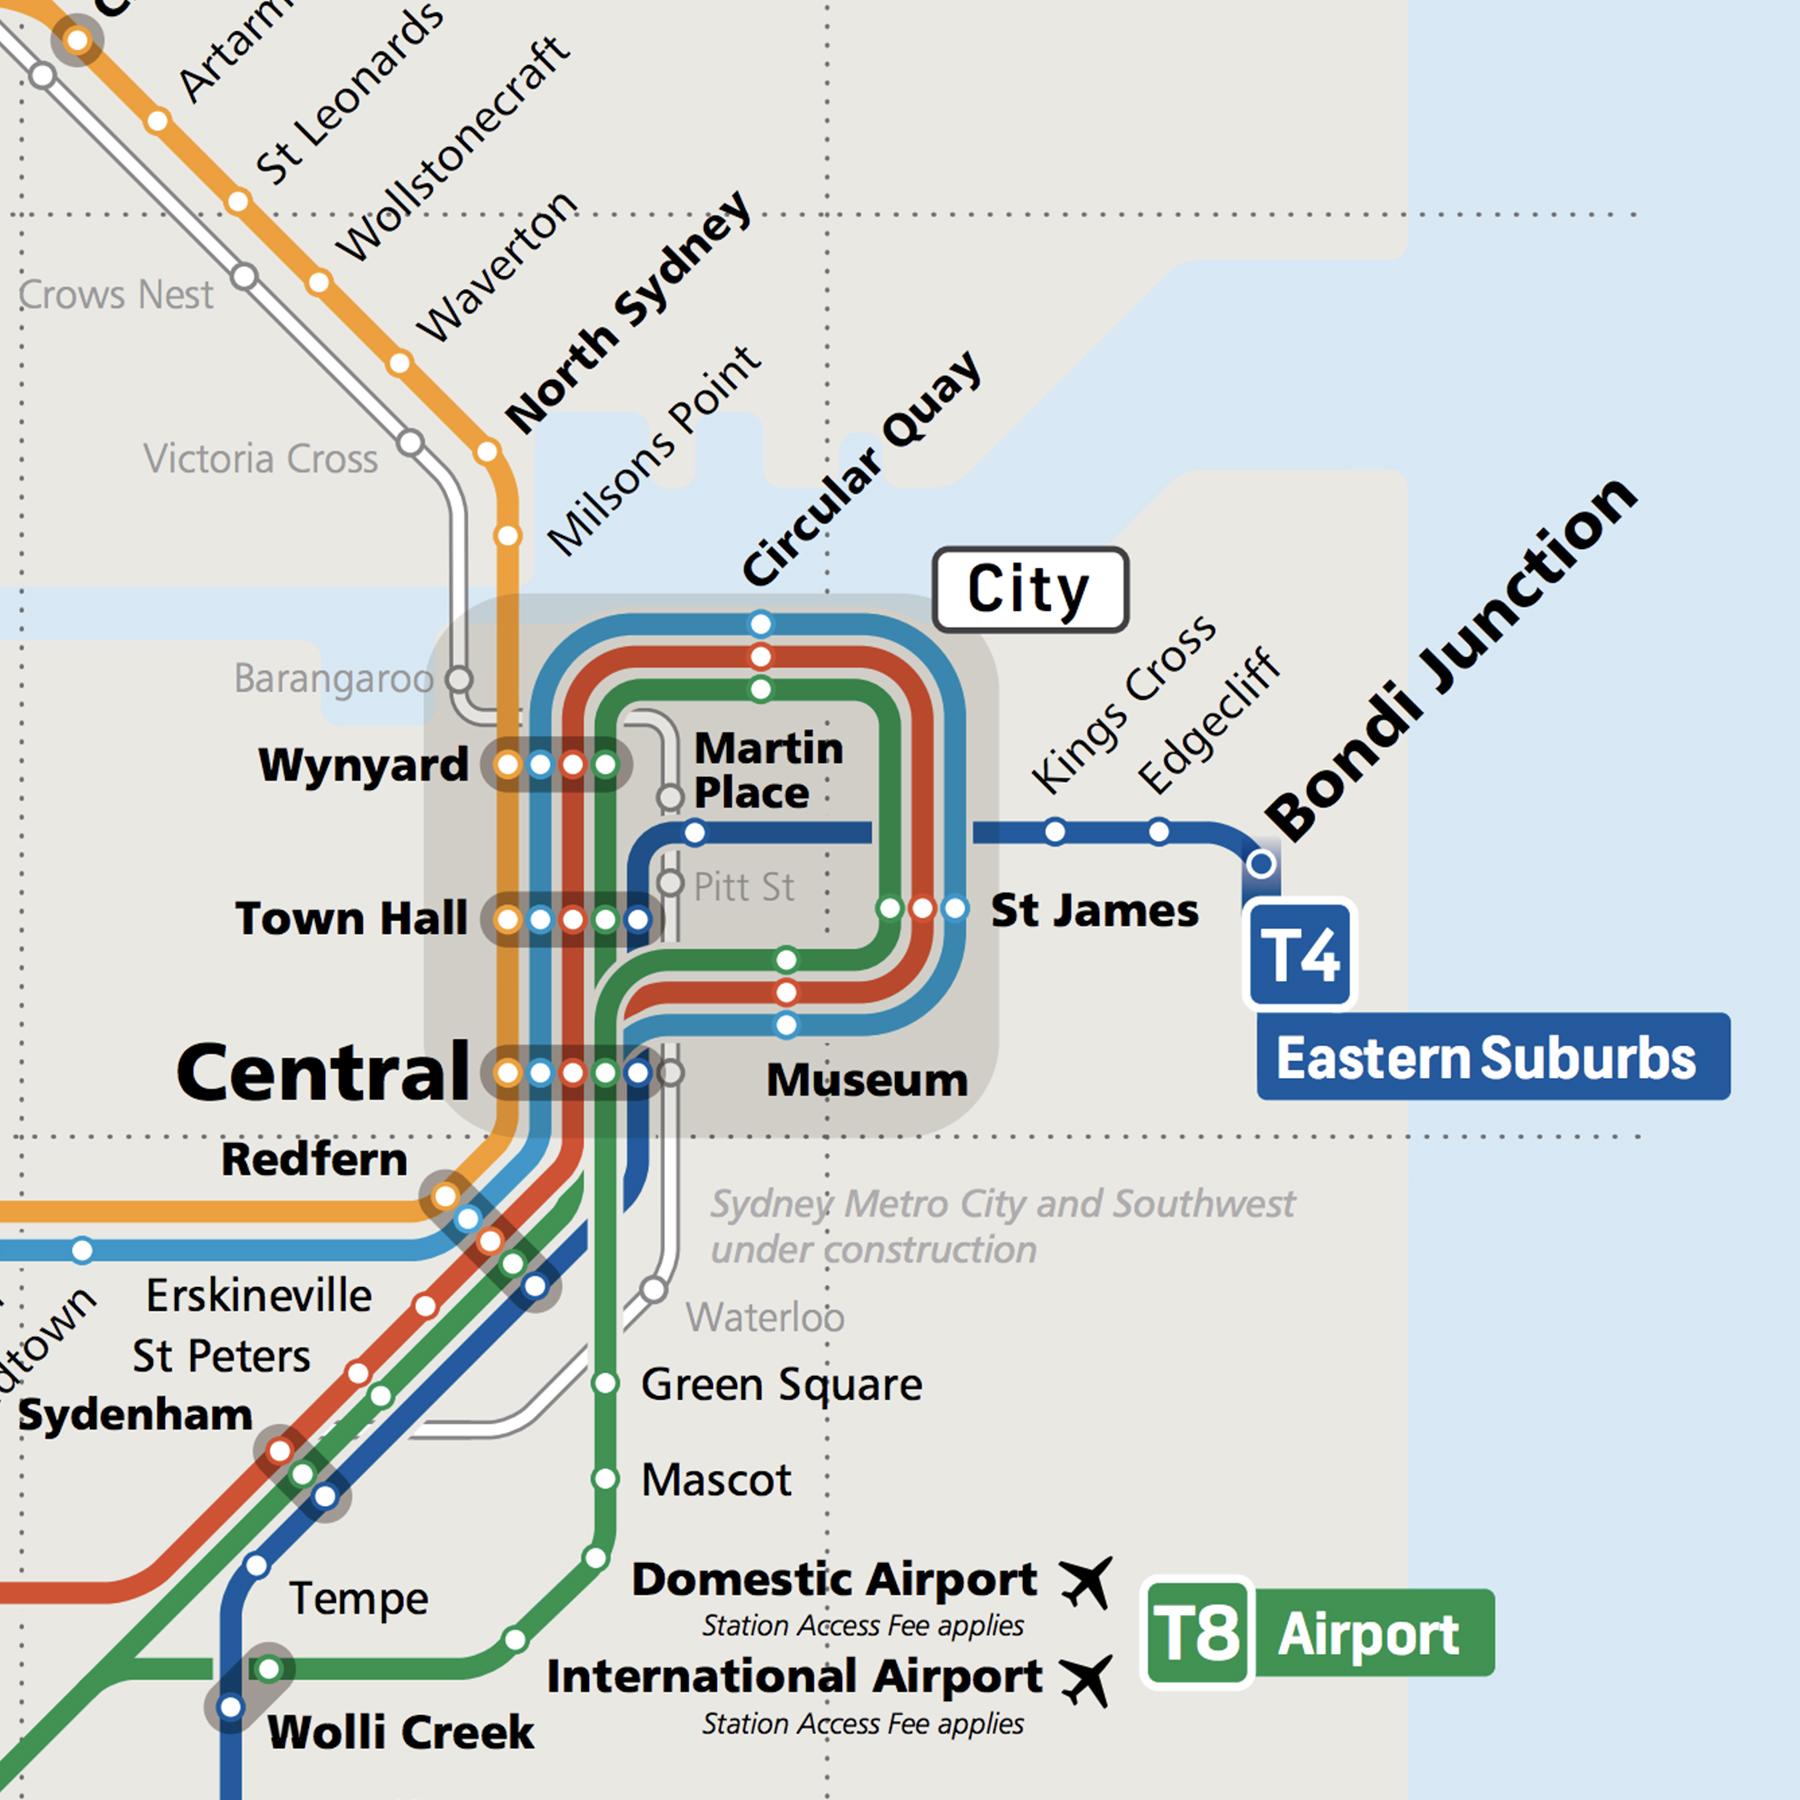 Travel around Sydney by train